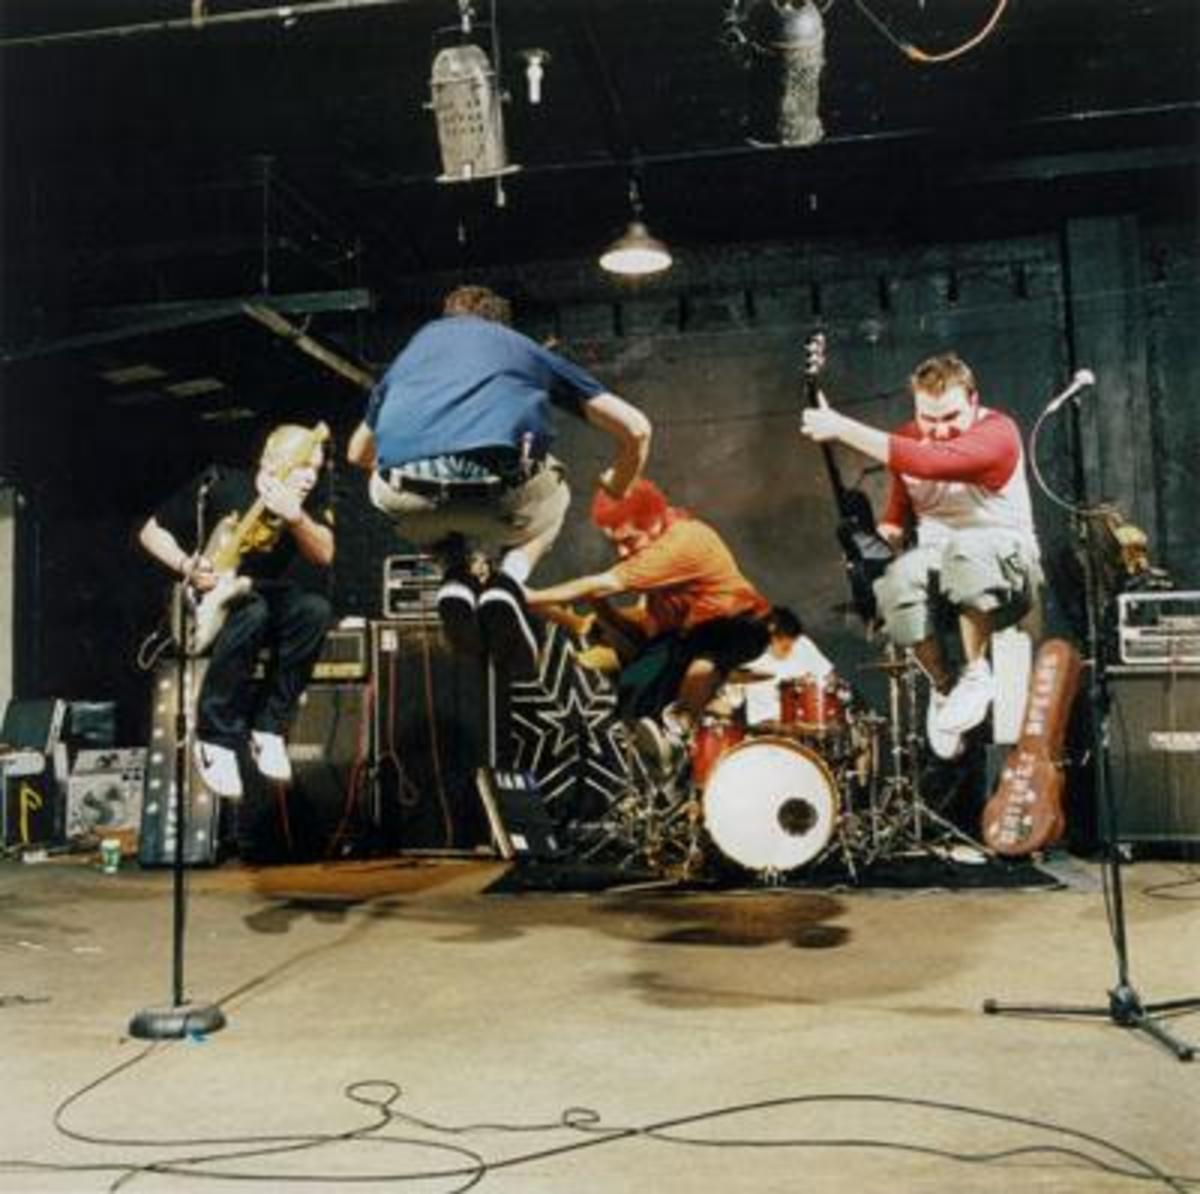 New Found Glory, a popular pop-punk band.